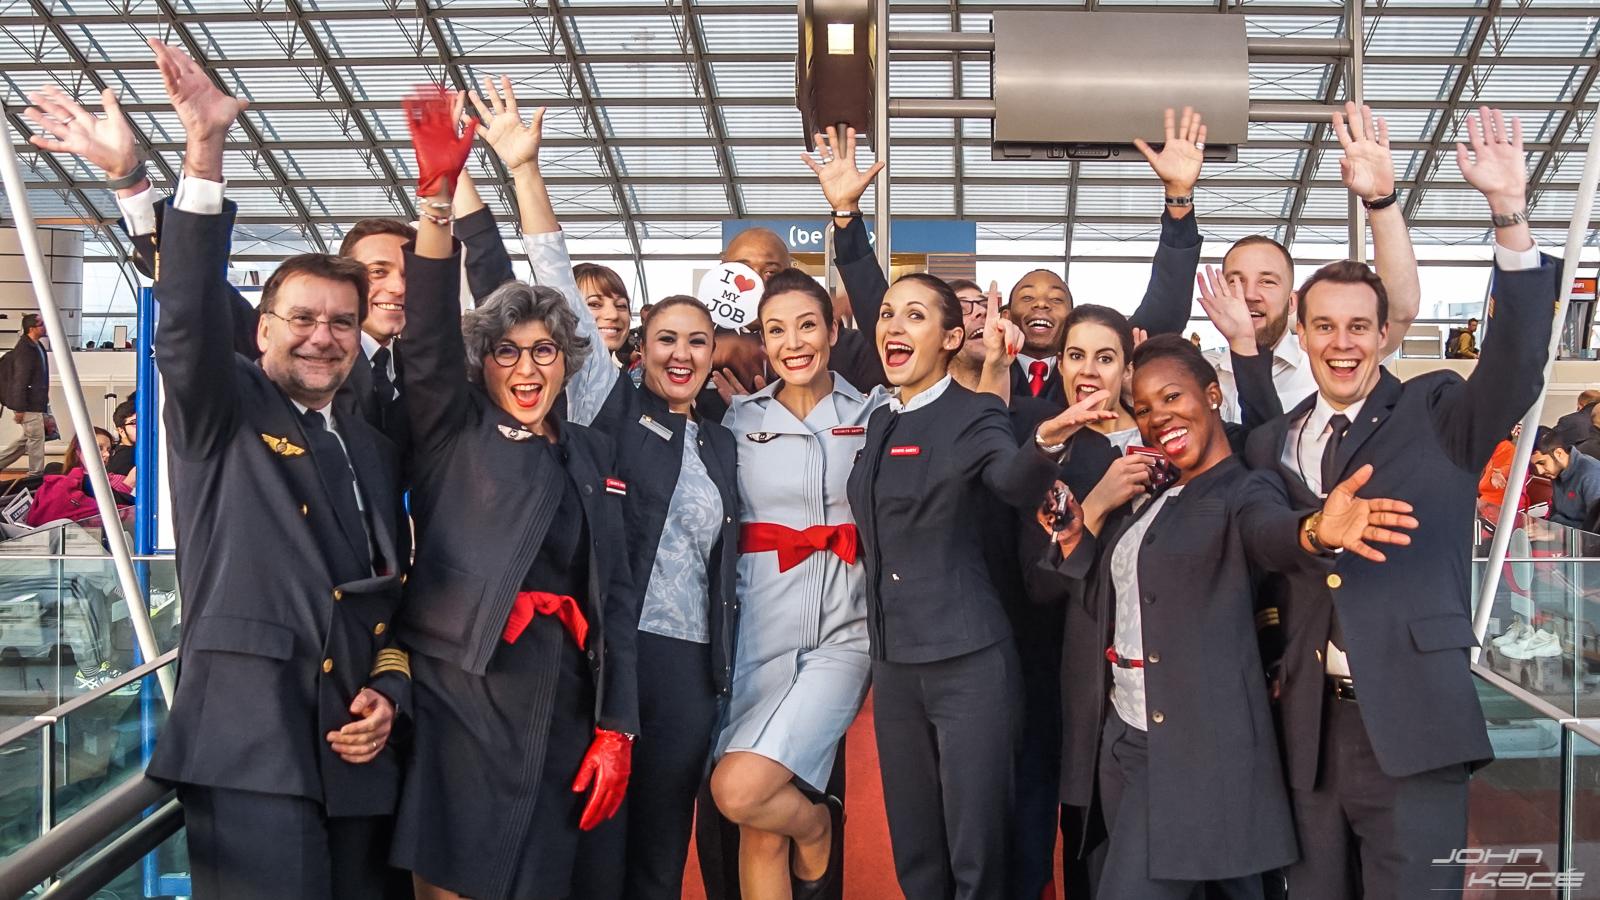 Air France I Love My Job Xavier Querat Hement